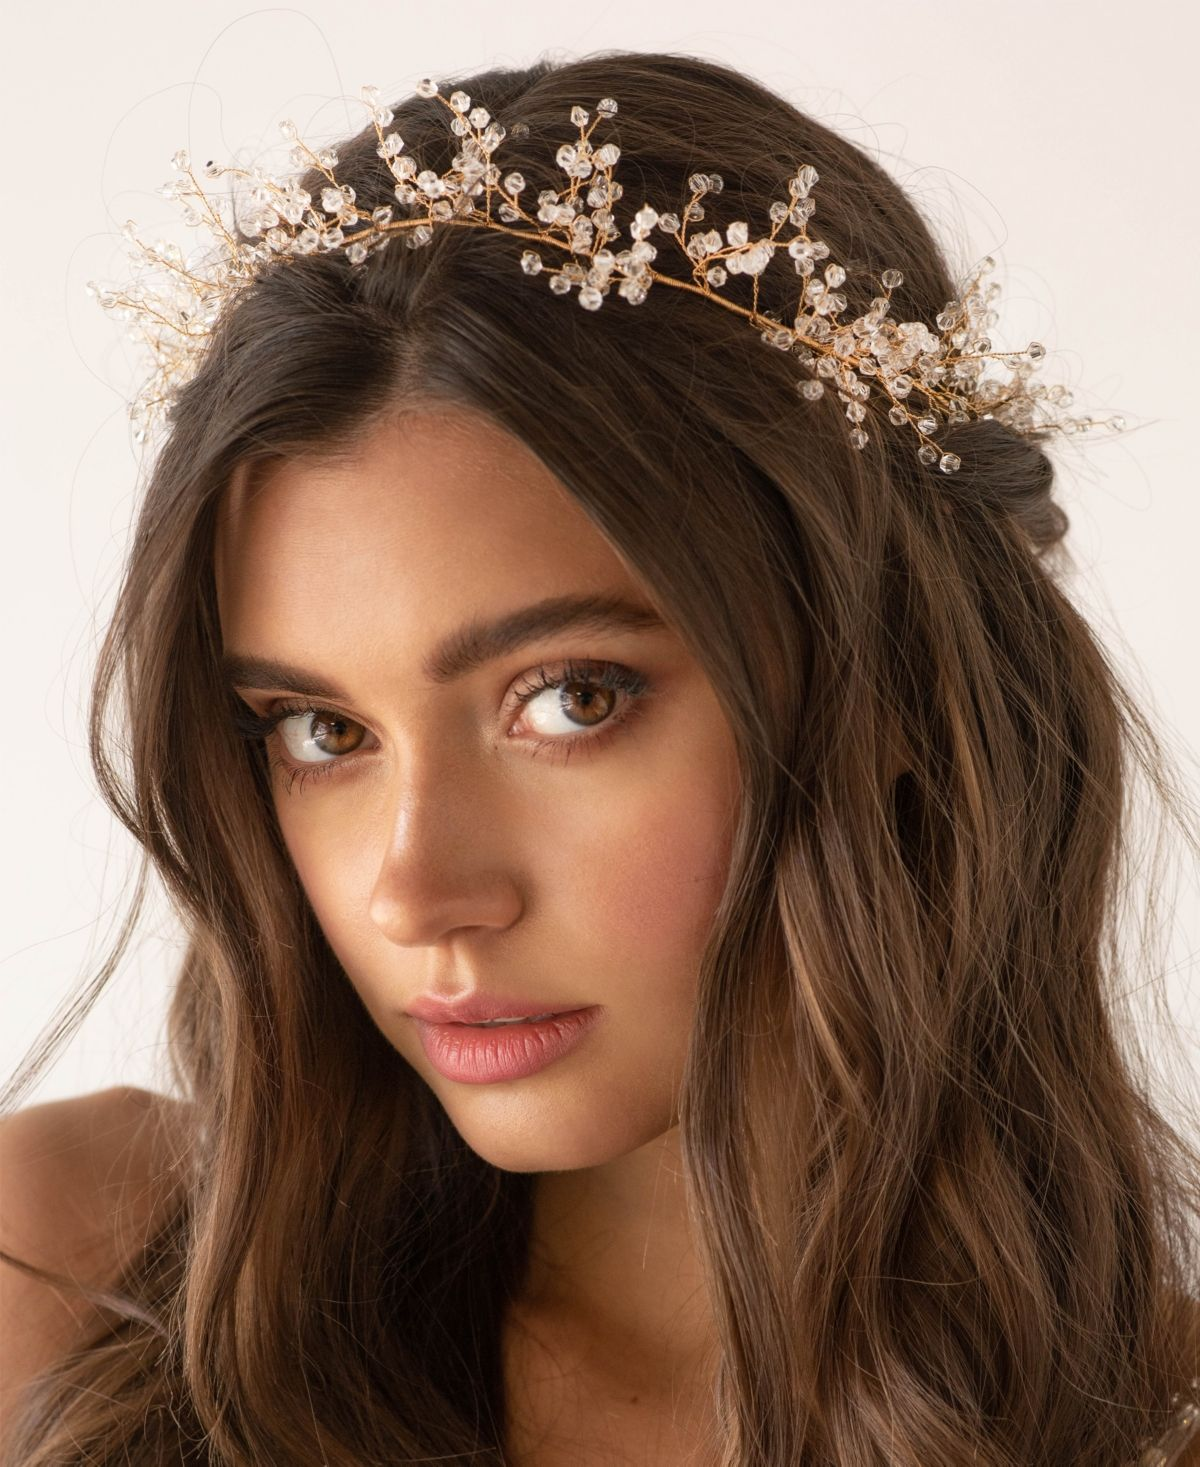 Soho Style Imitation Pearl Boho Bridal Hair Crown Reviews Beauty Macy S In 2020 Crown Hairstyles Boho Bridal Hair Wedding Hairstyles For Long Hair